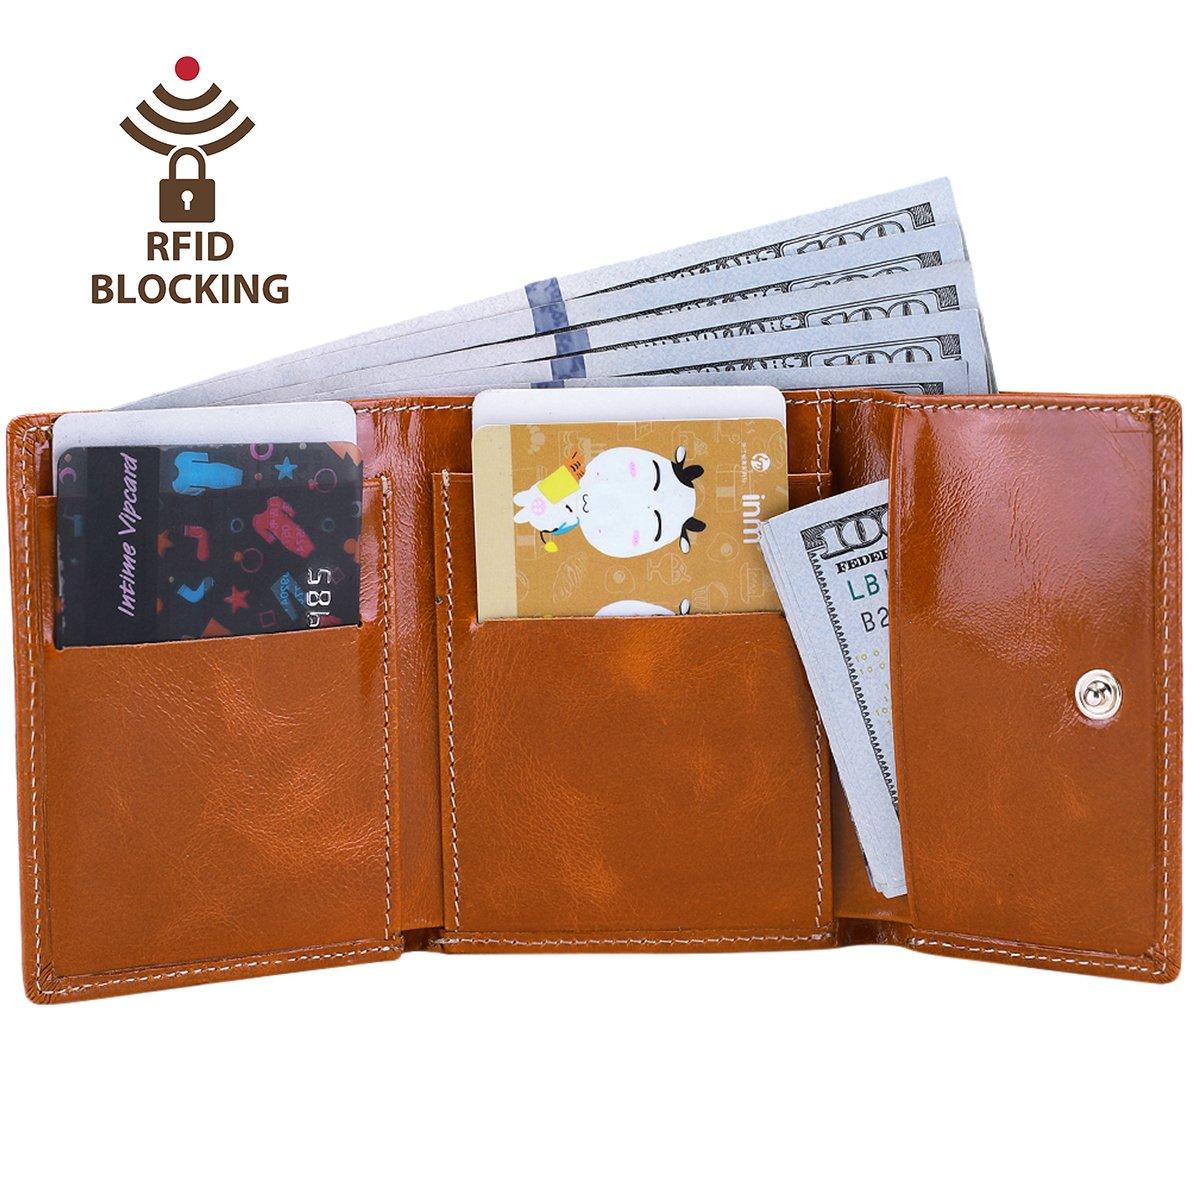 Itslife Slim Minimalist Front Pocket RFID Blocking Leather Wallets for Women (Tan)